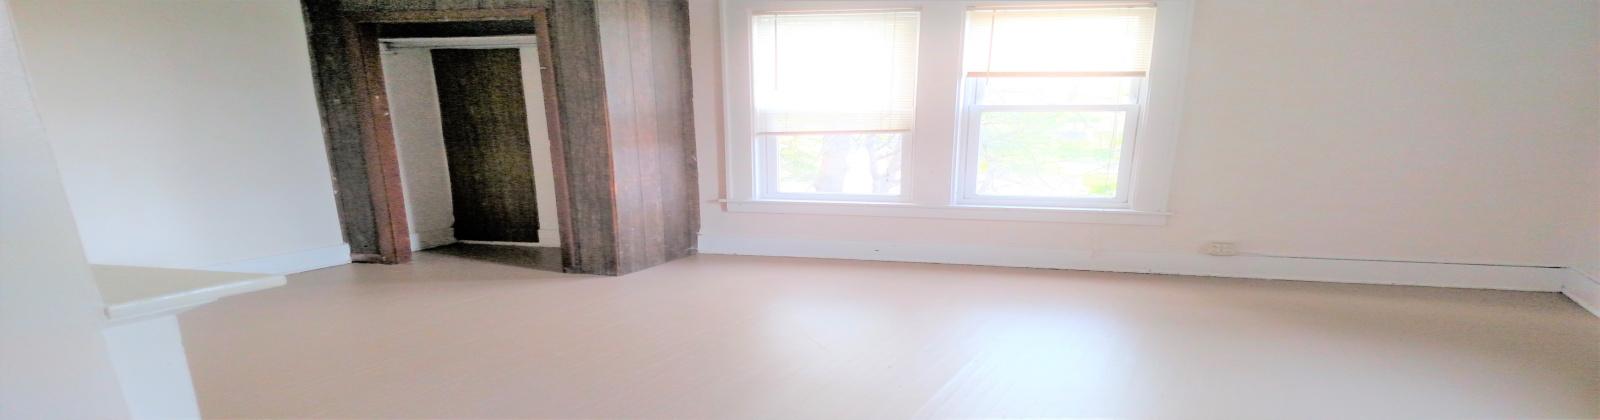 56 W Union St. Athens, Ohio, 5 Bedrooms Bedrooms, ,3 BathroomsBathrooms,Apartment,For Rent,W Union,1069